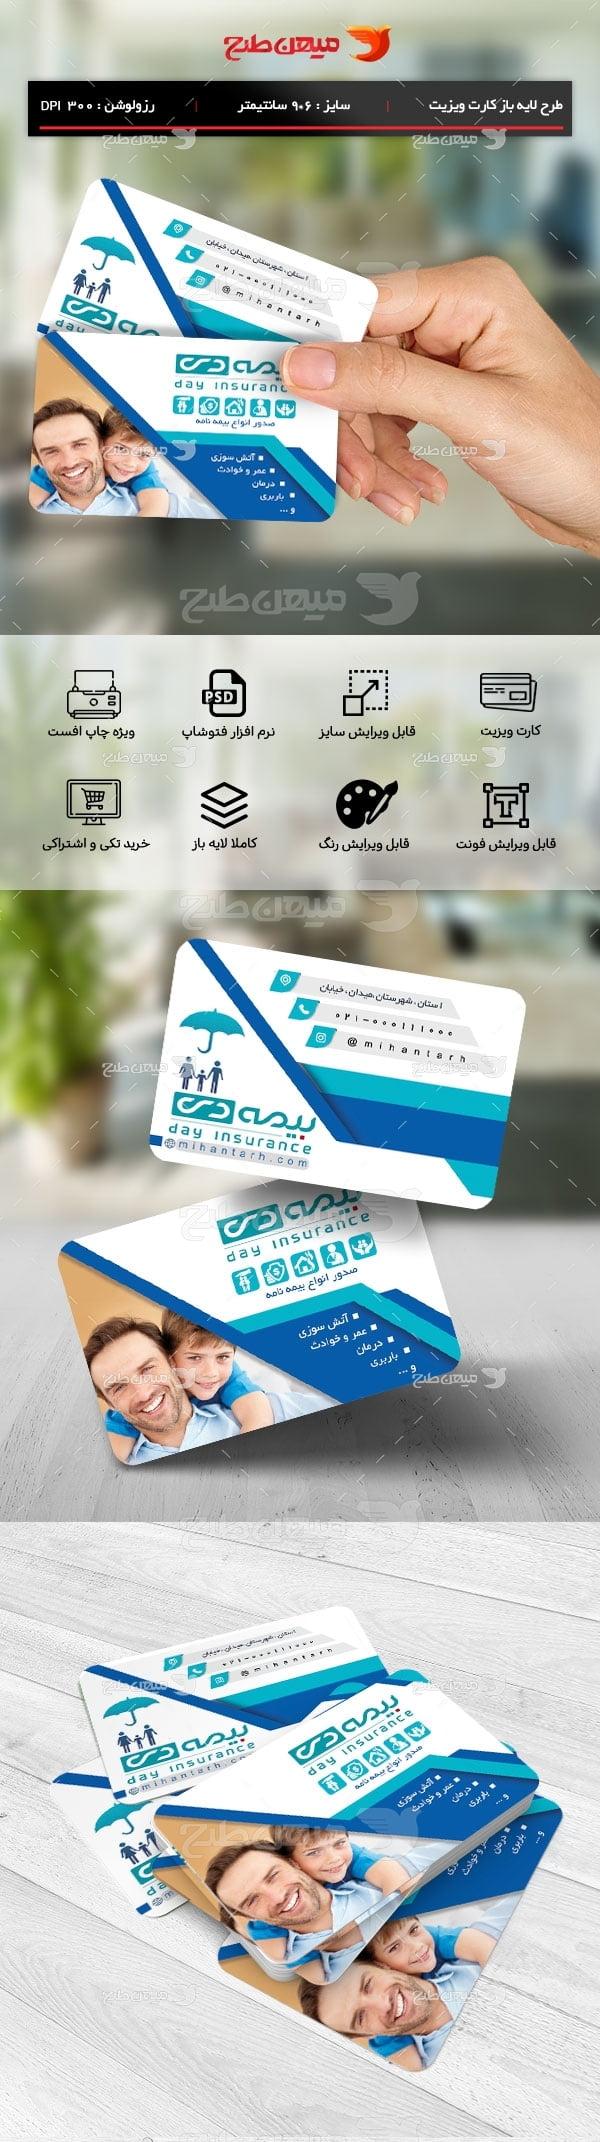 طرح لایه باز کارت ویزیت بیمه دی